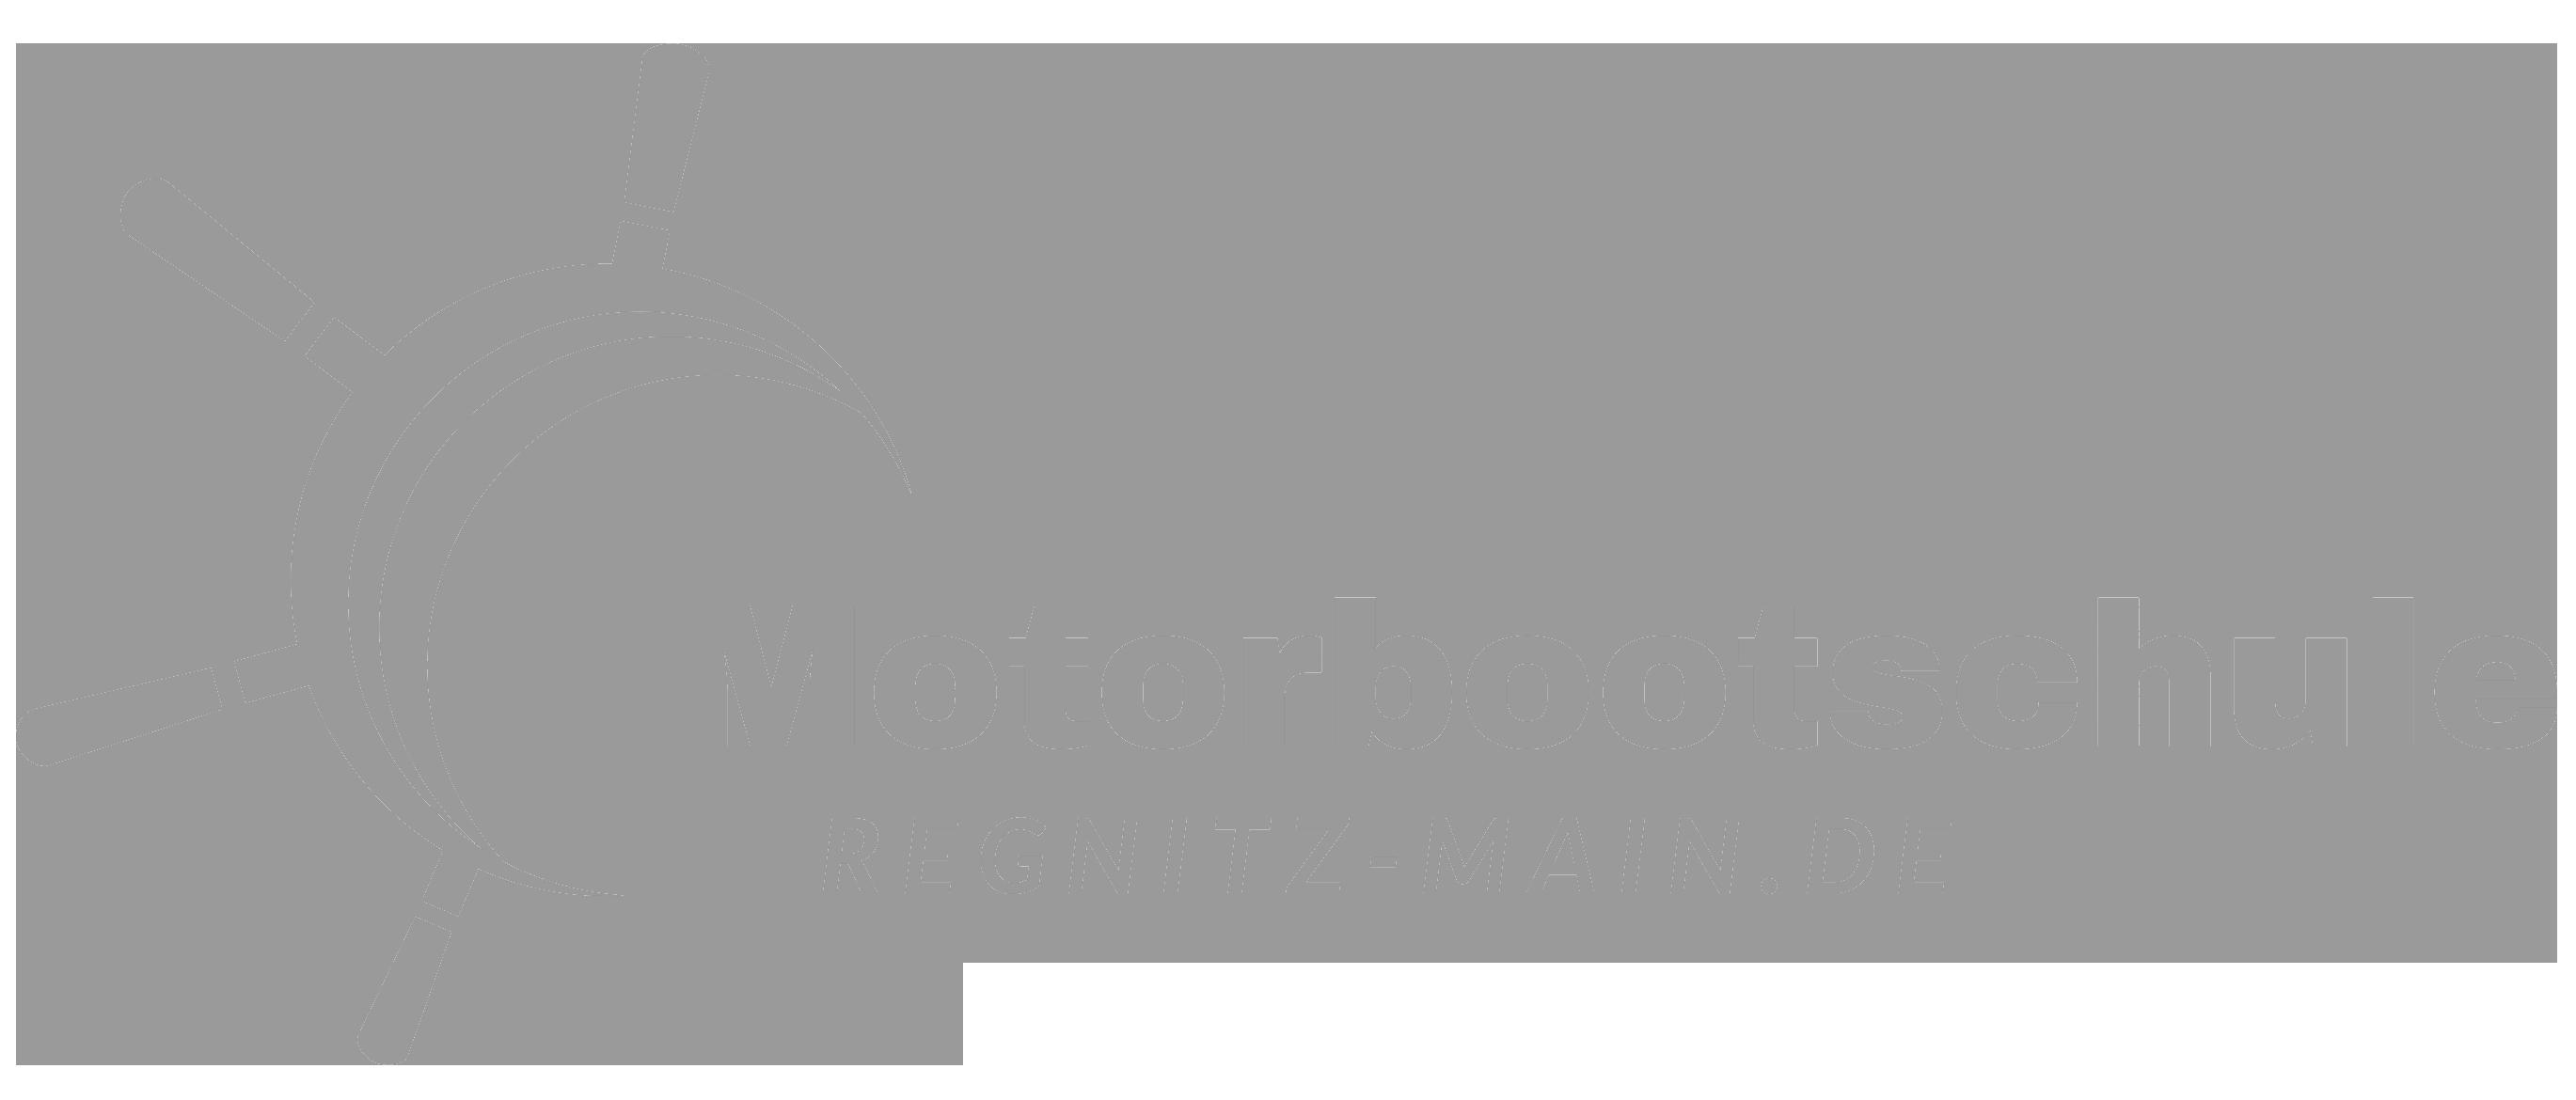 Motorbootschule-Regnitz-Main für SBF bei Bamberg